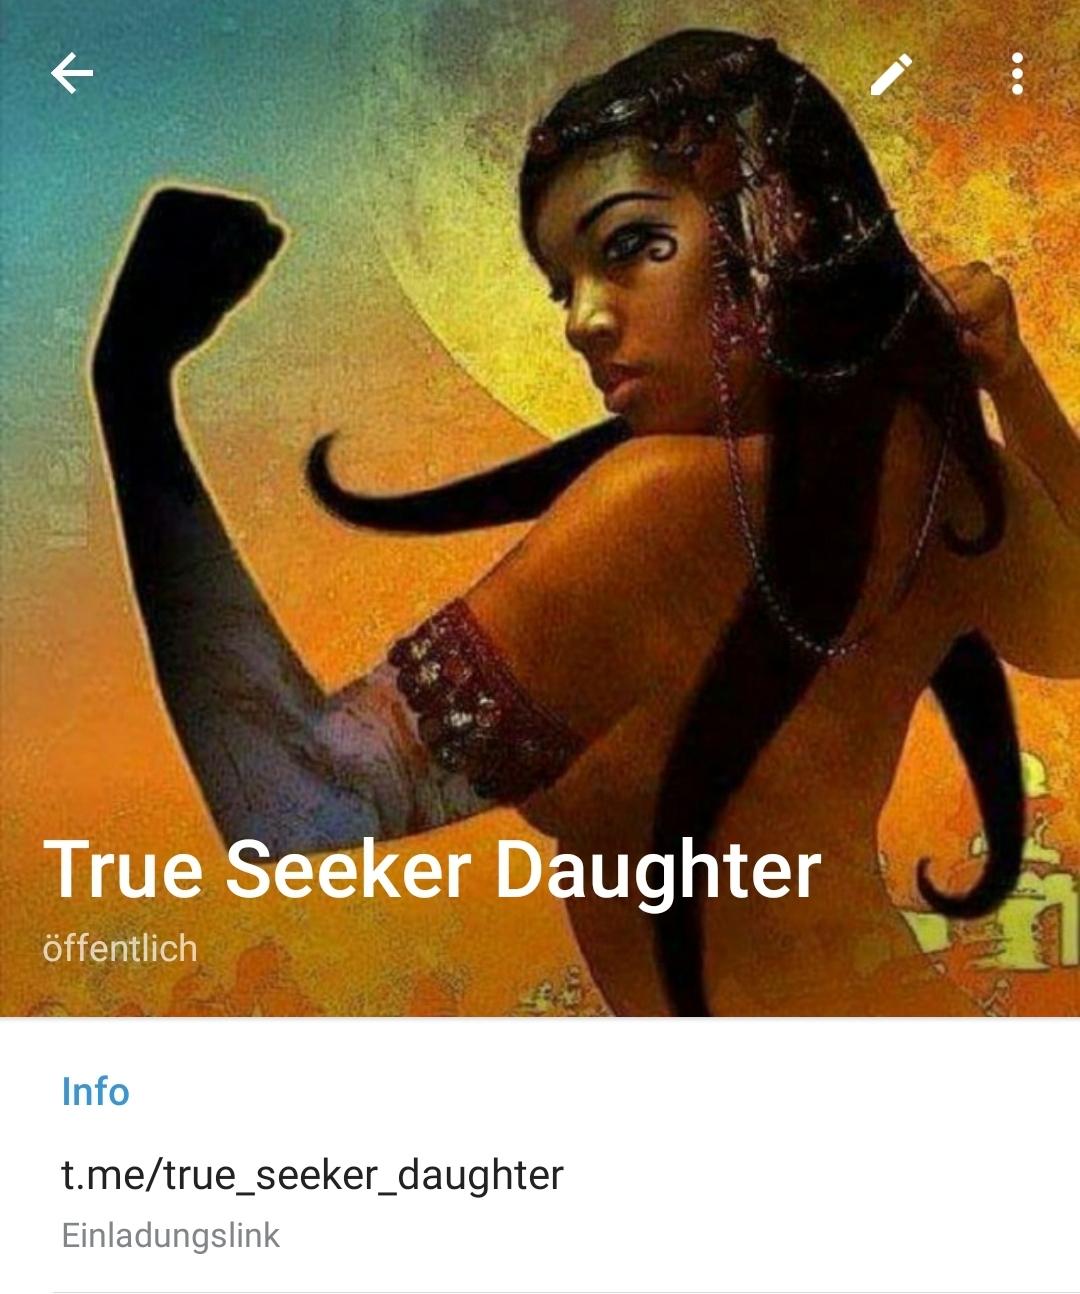 True Seeker Daughter